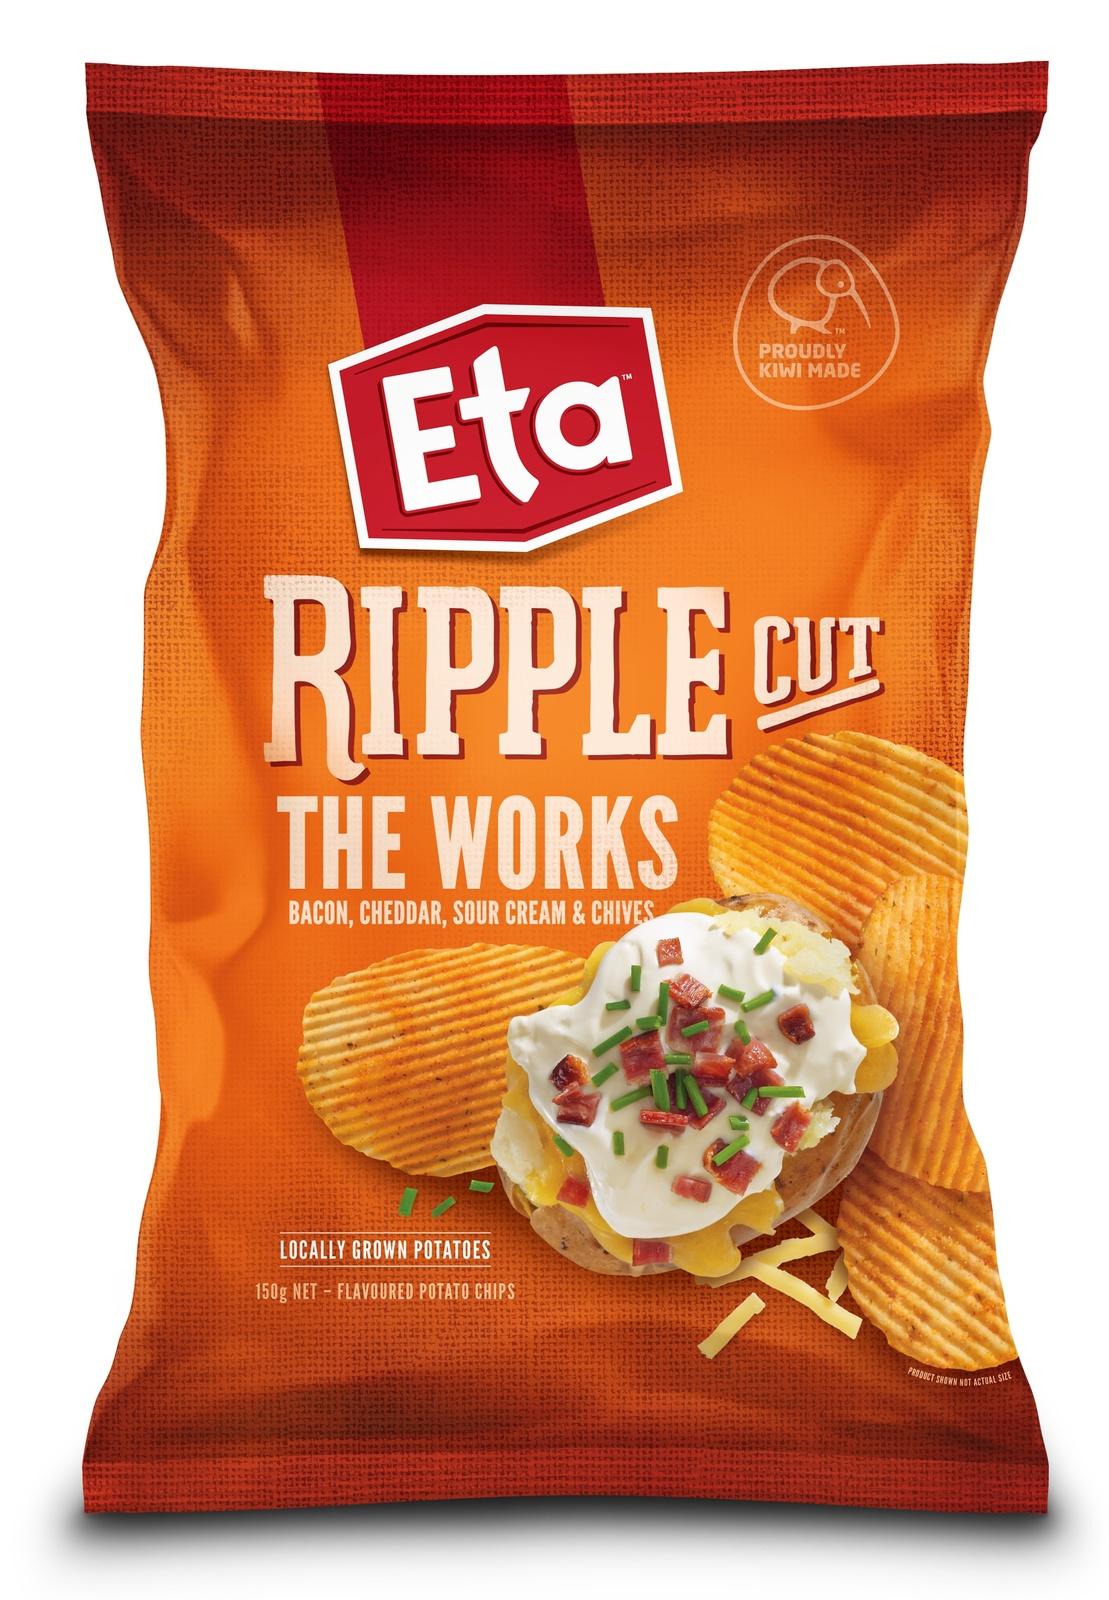 Eta Ripple Cut The Works (150g) image